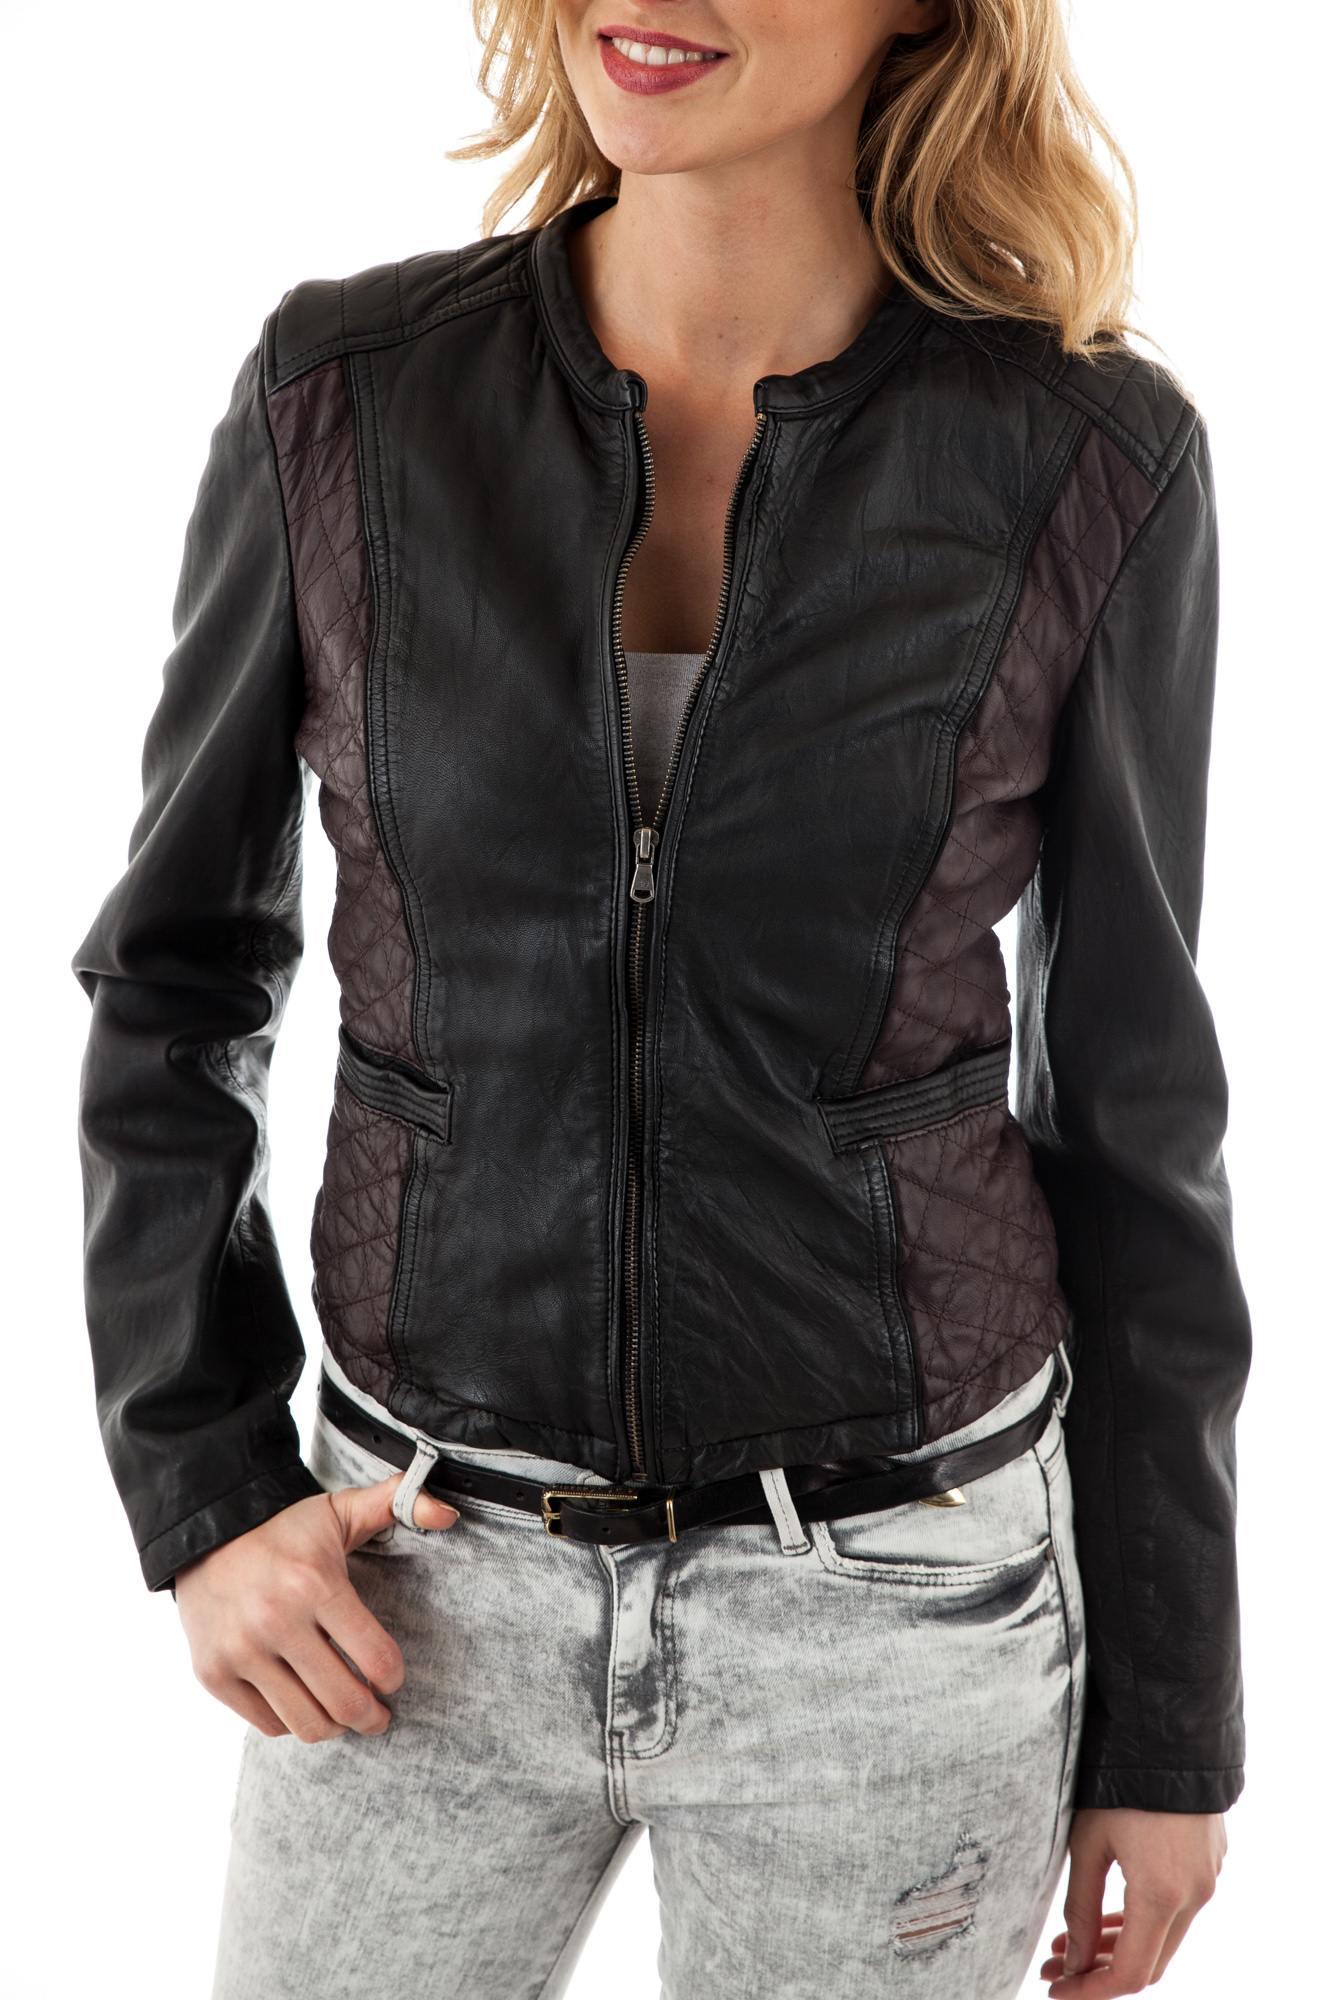 bcc101cd07f4 Blouson Femme Oakwood FAME BI BORDEAUX - Cuir-city.com